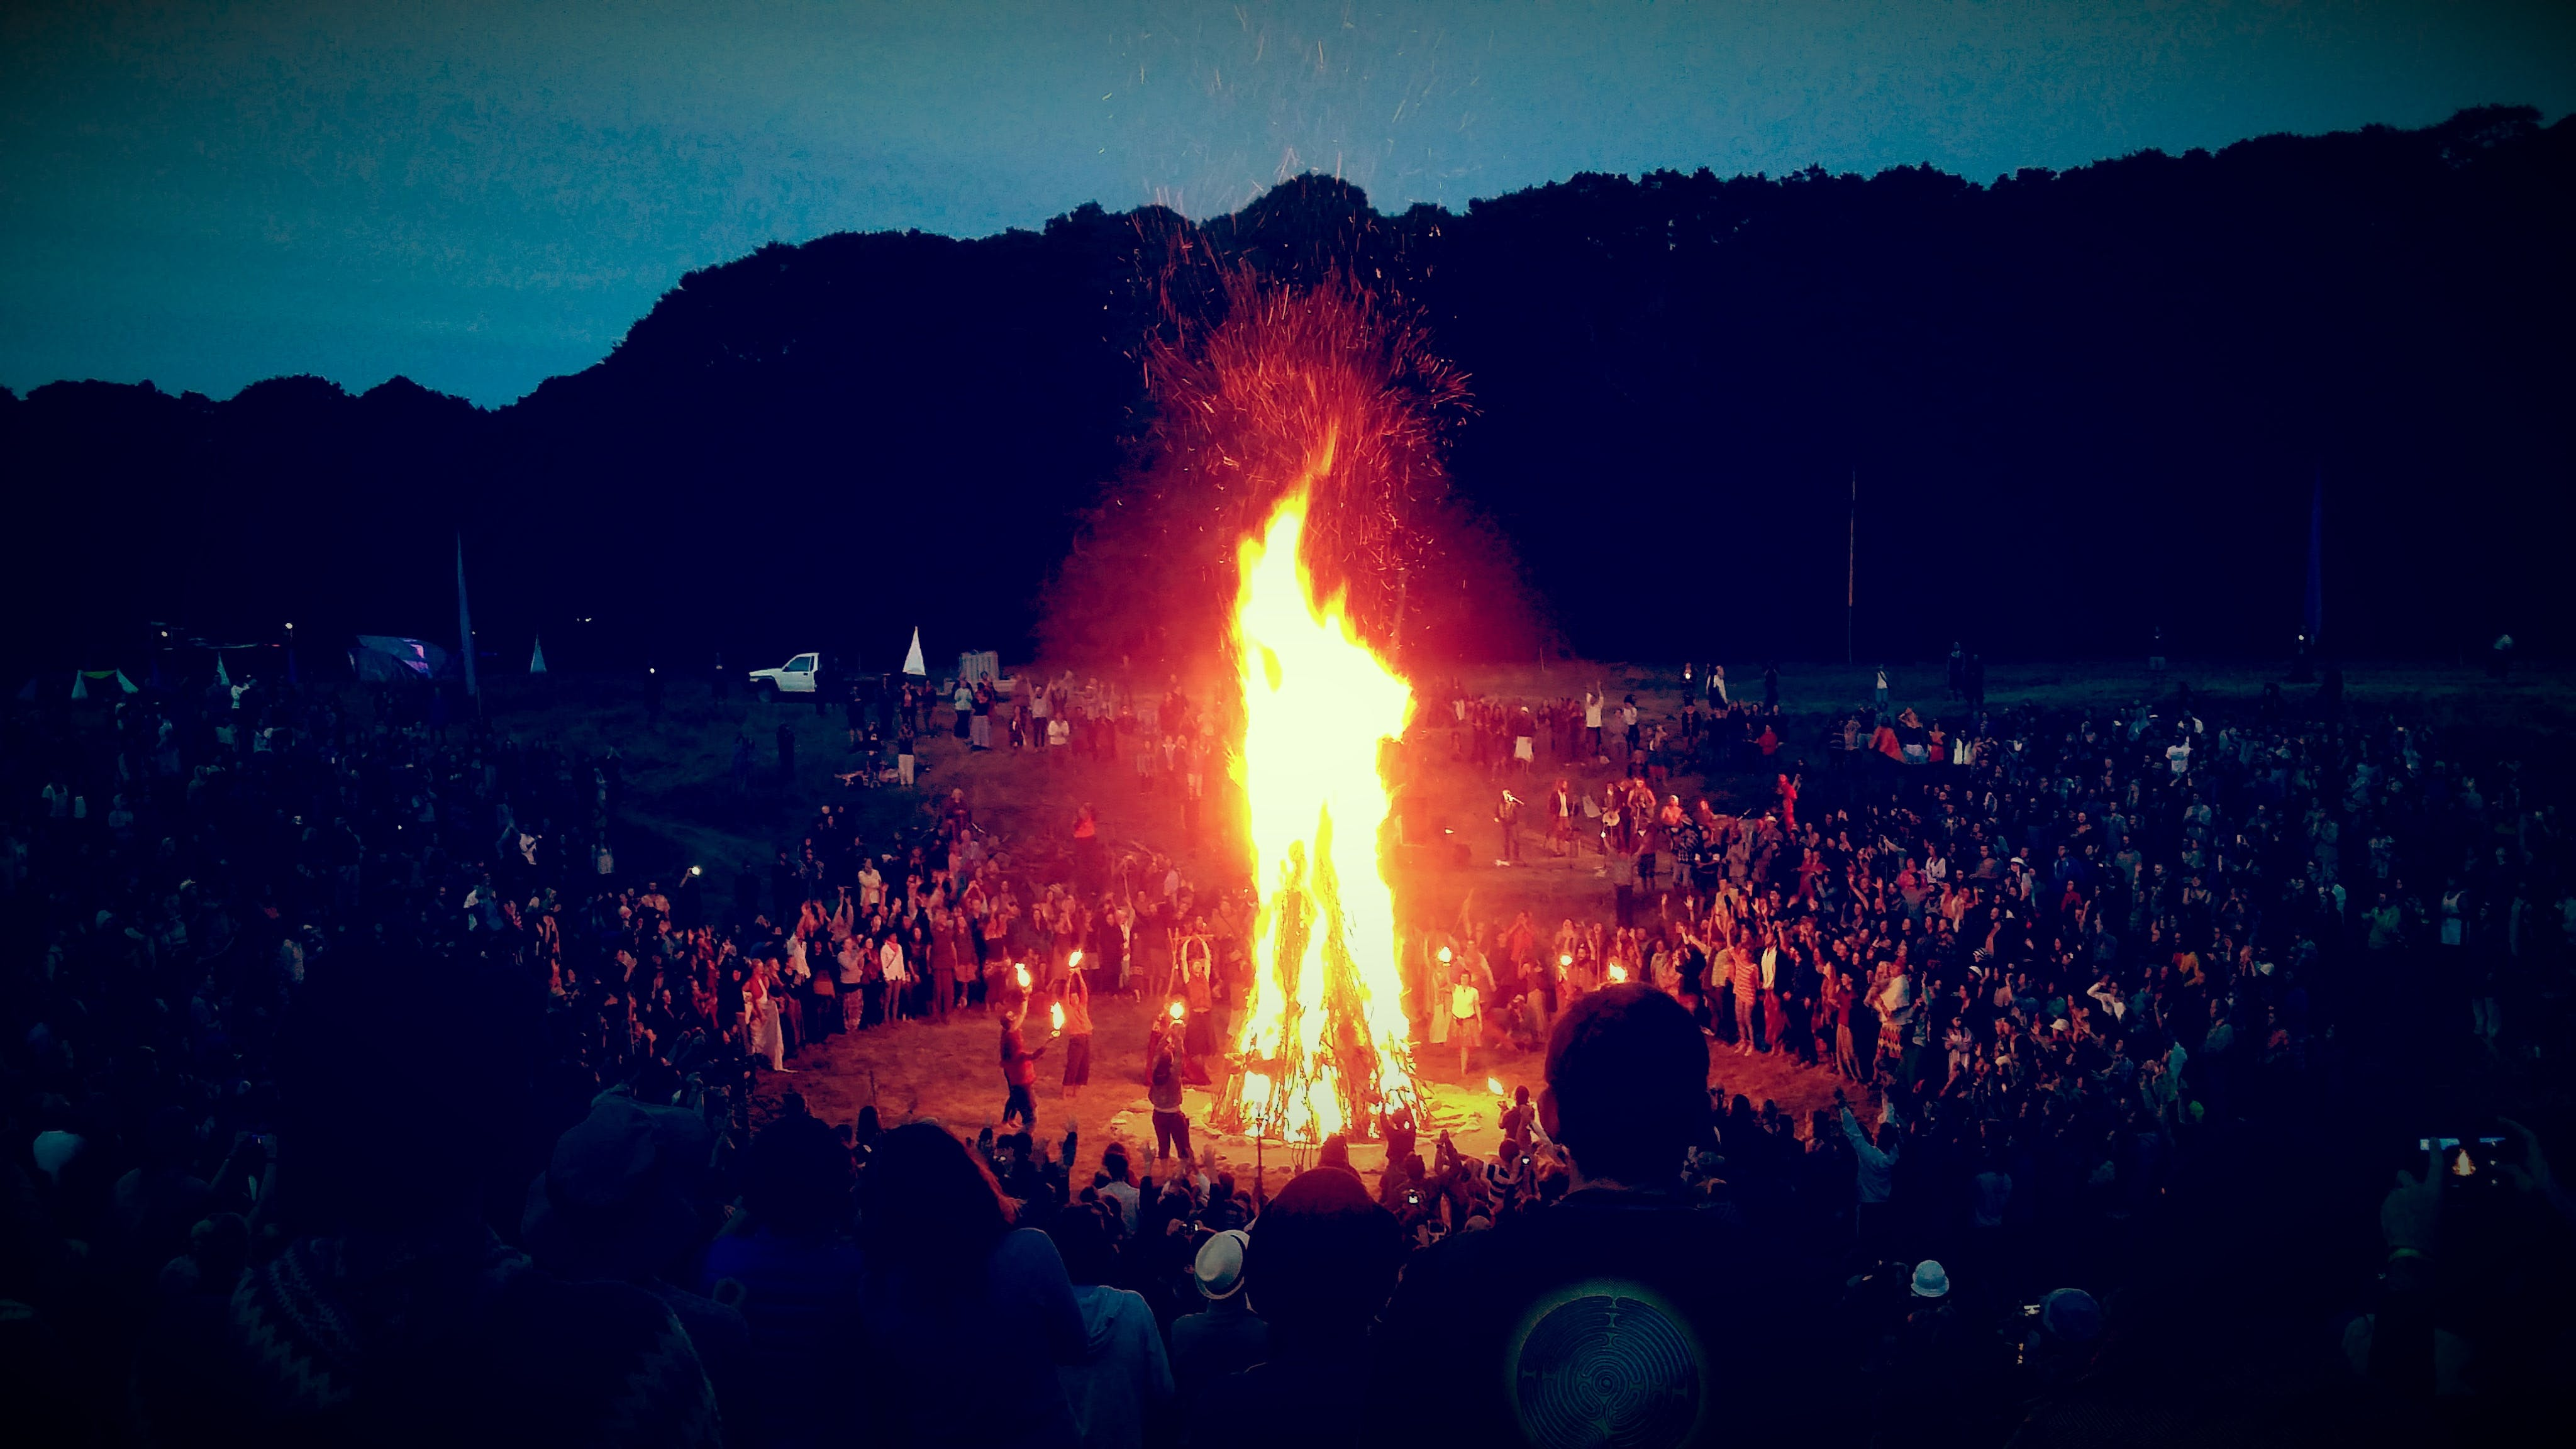 Free stock photo of atmosphere, bonfire, ceremony, dancing